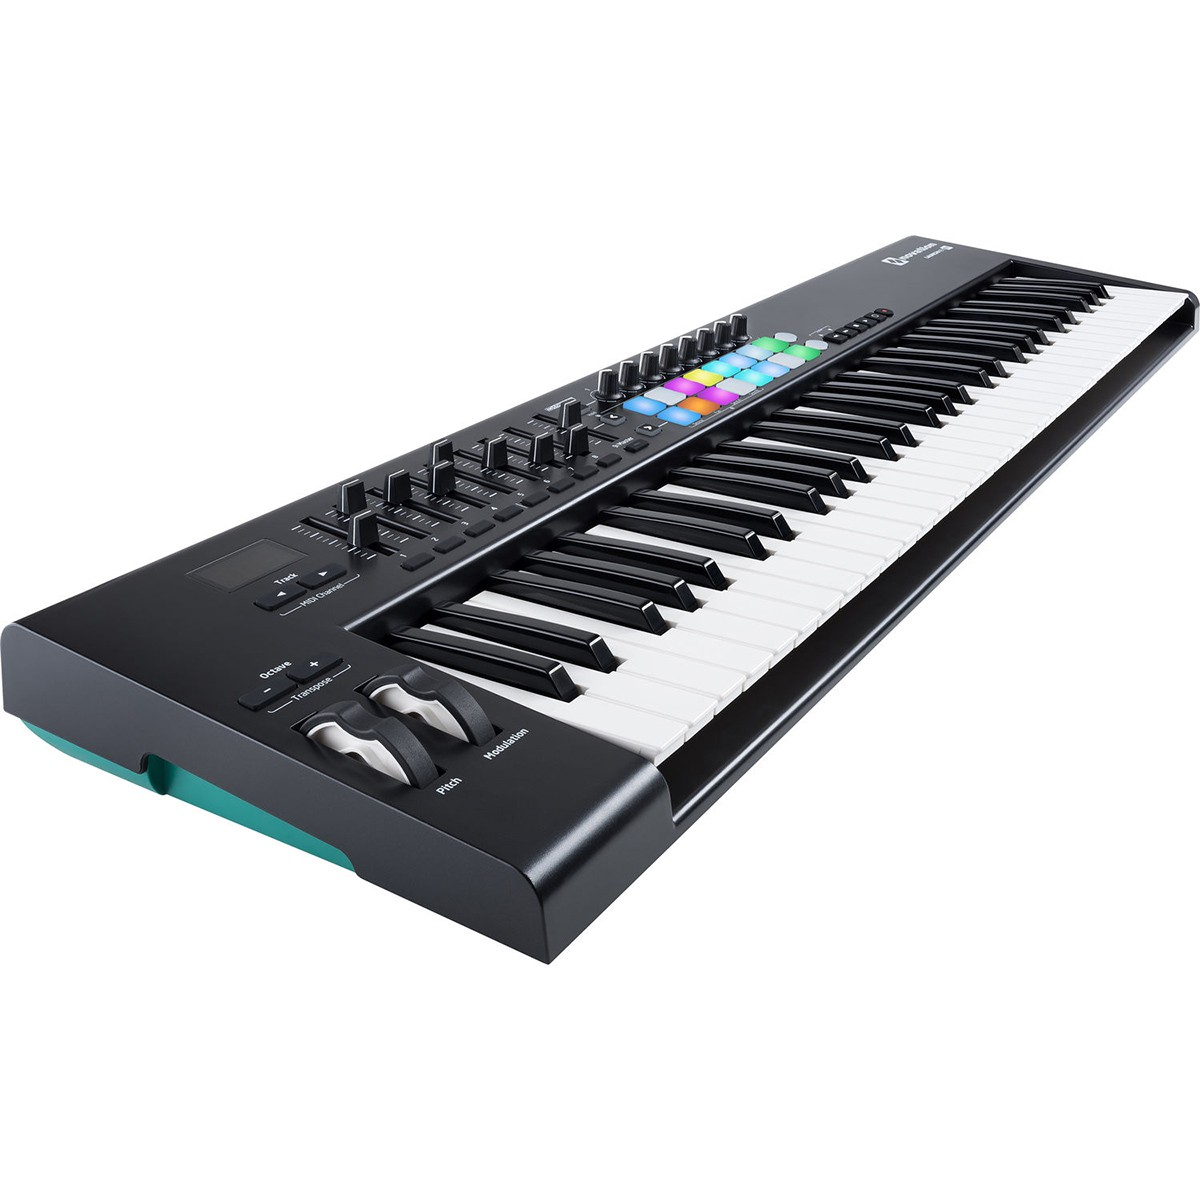 TECLADO CONTROLADOR MIDI USB NOVATION LAUNCHKEY 61 MK2